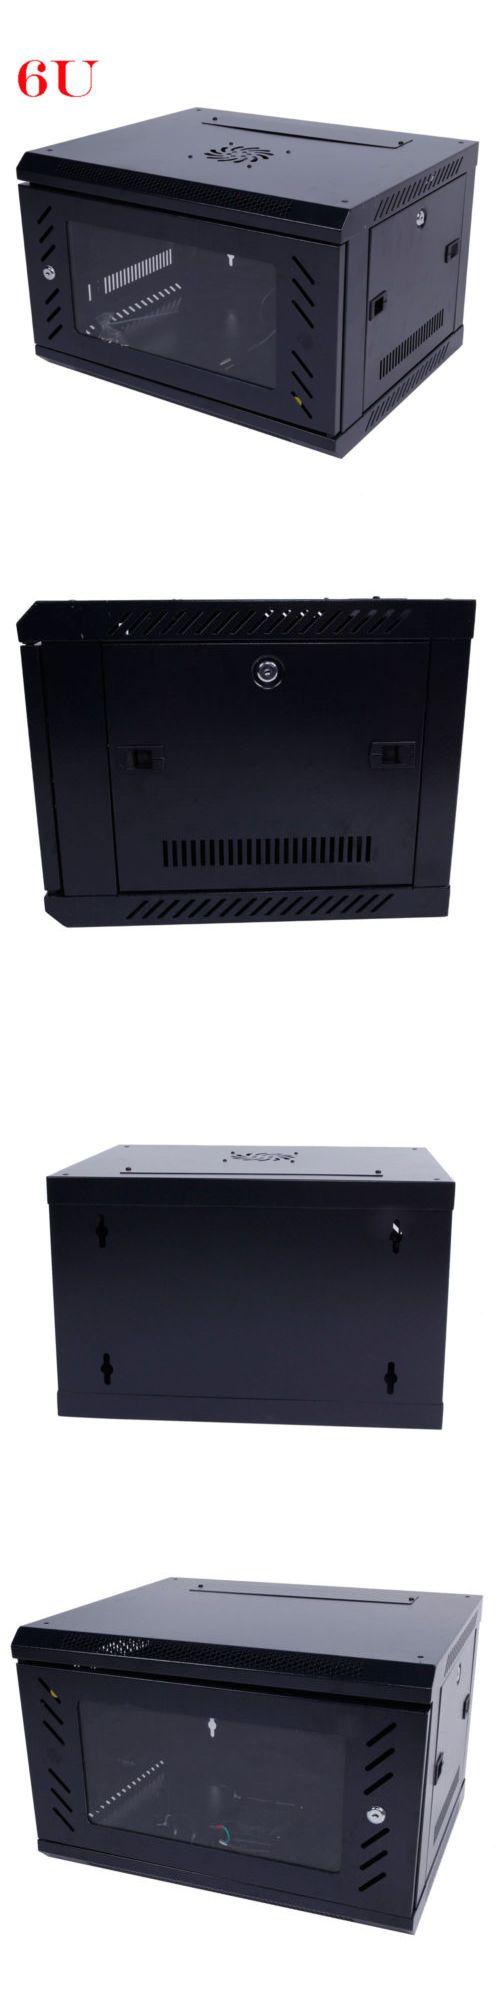 Racks Chassis And Patch Panels 51197 6u Wall Mount Network Server Data Cabinet Enclosure Rack Door Lock Cooling Fan Data Cabinet Patch Panels Wall Mount Rack